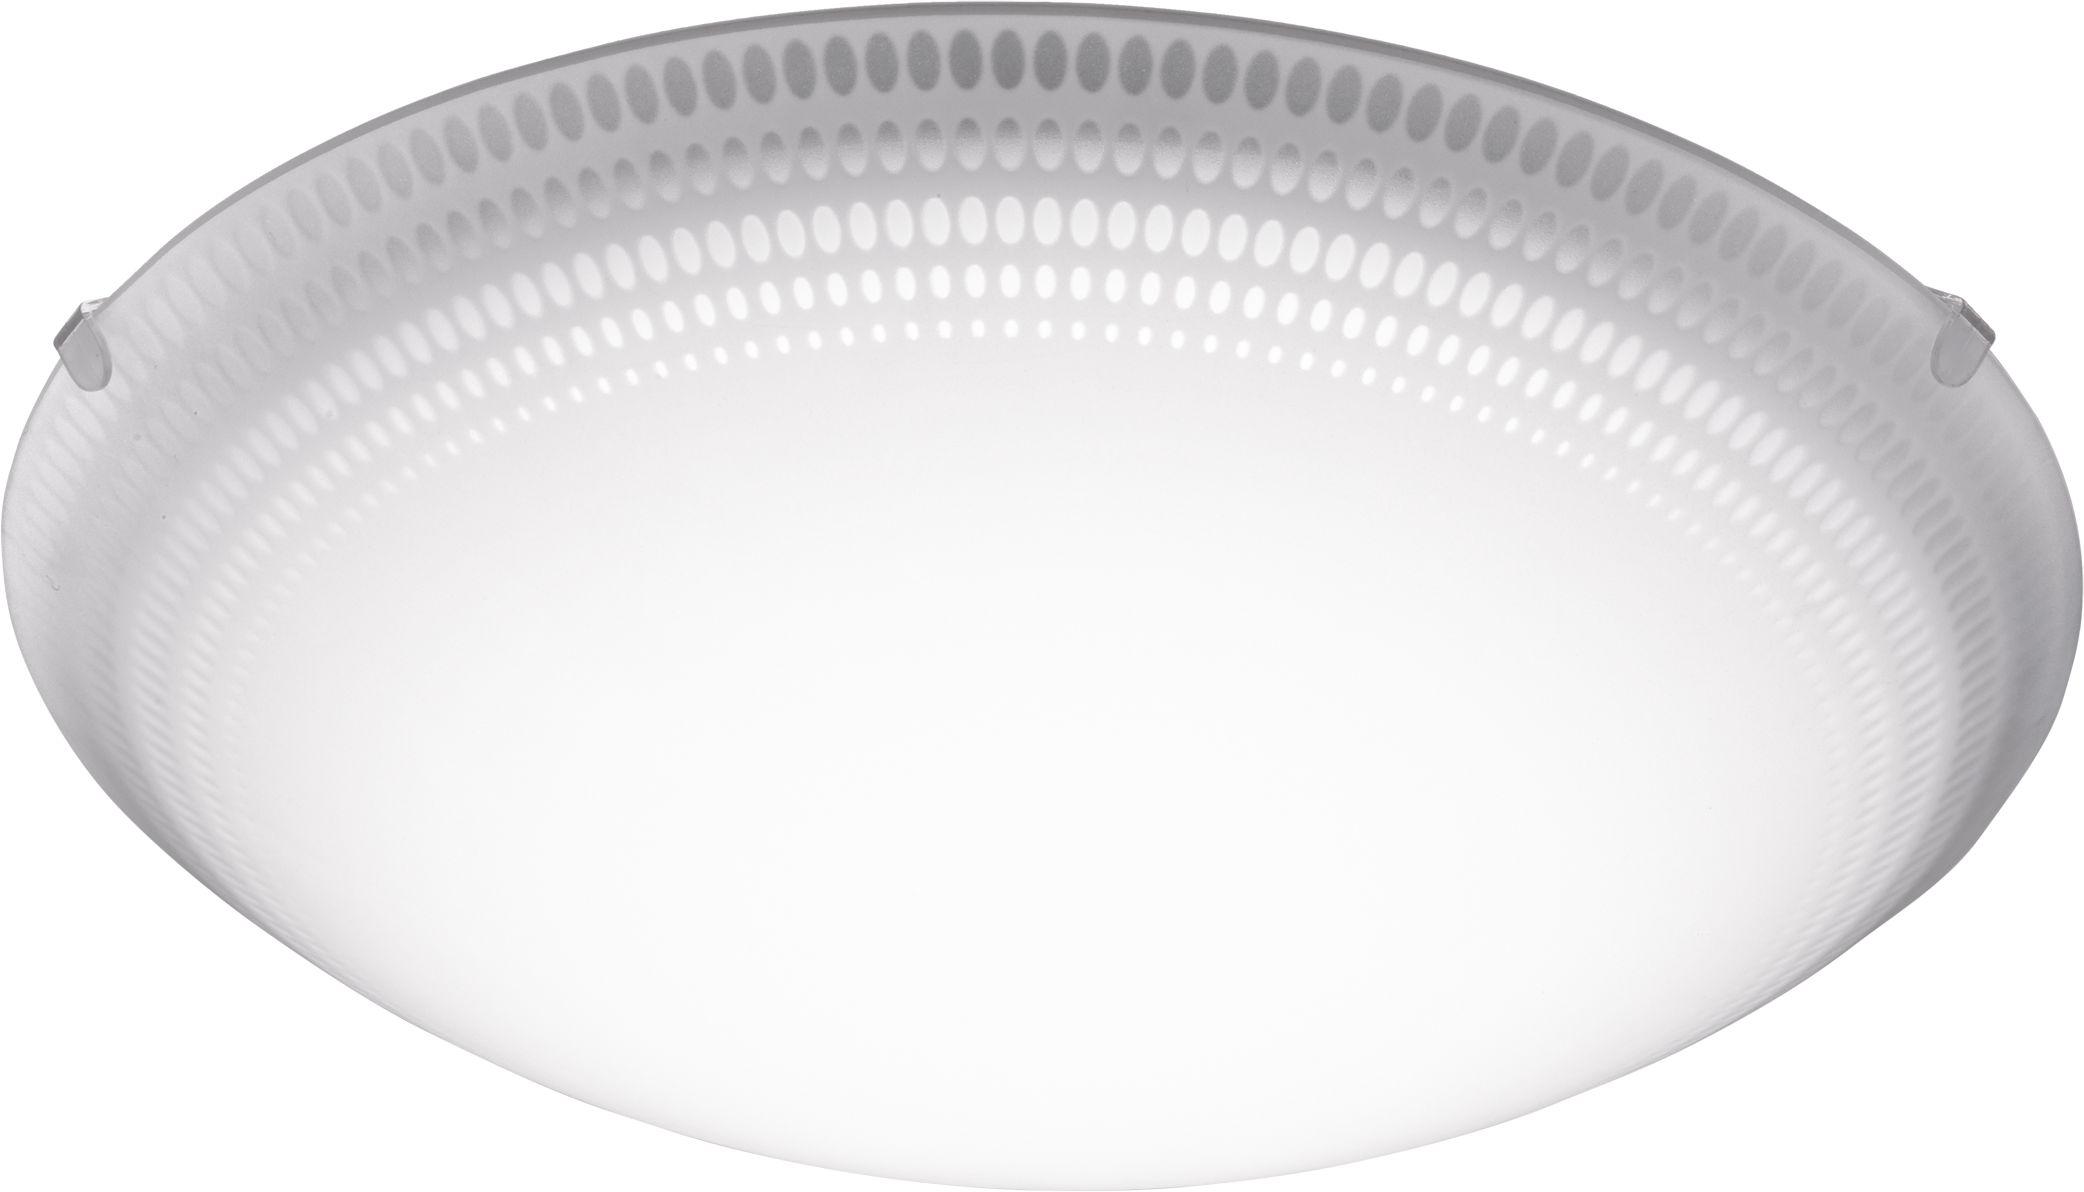 Eglo plafon LED Magitta 1 95673 - SUPER OFERTA - RABAT w koszyku